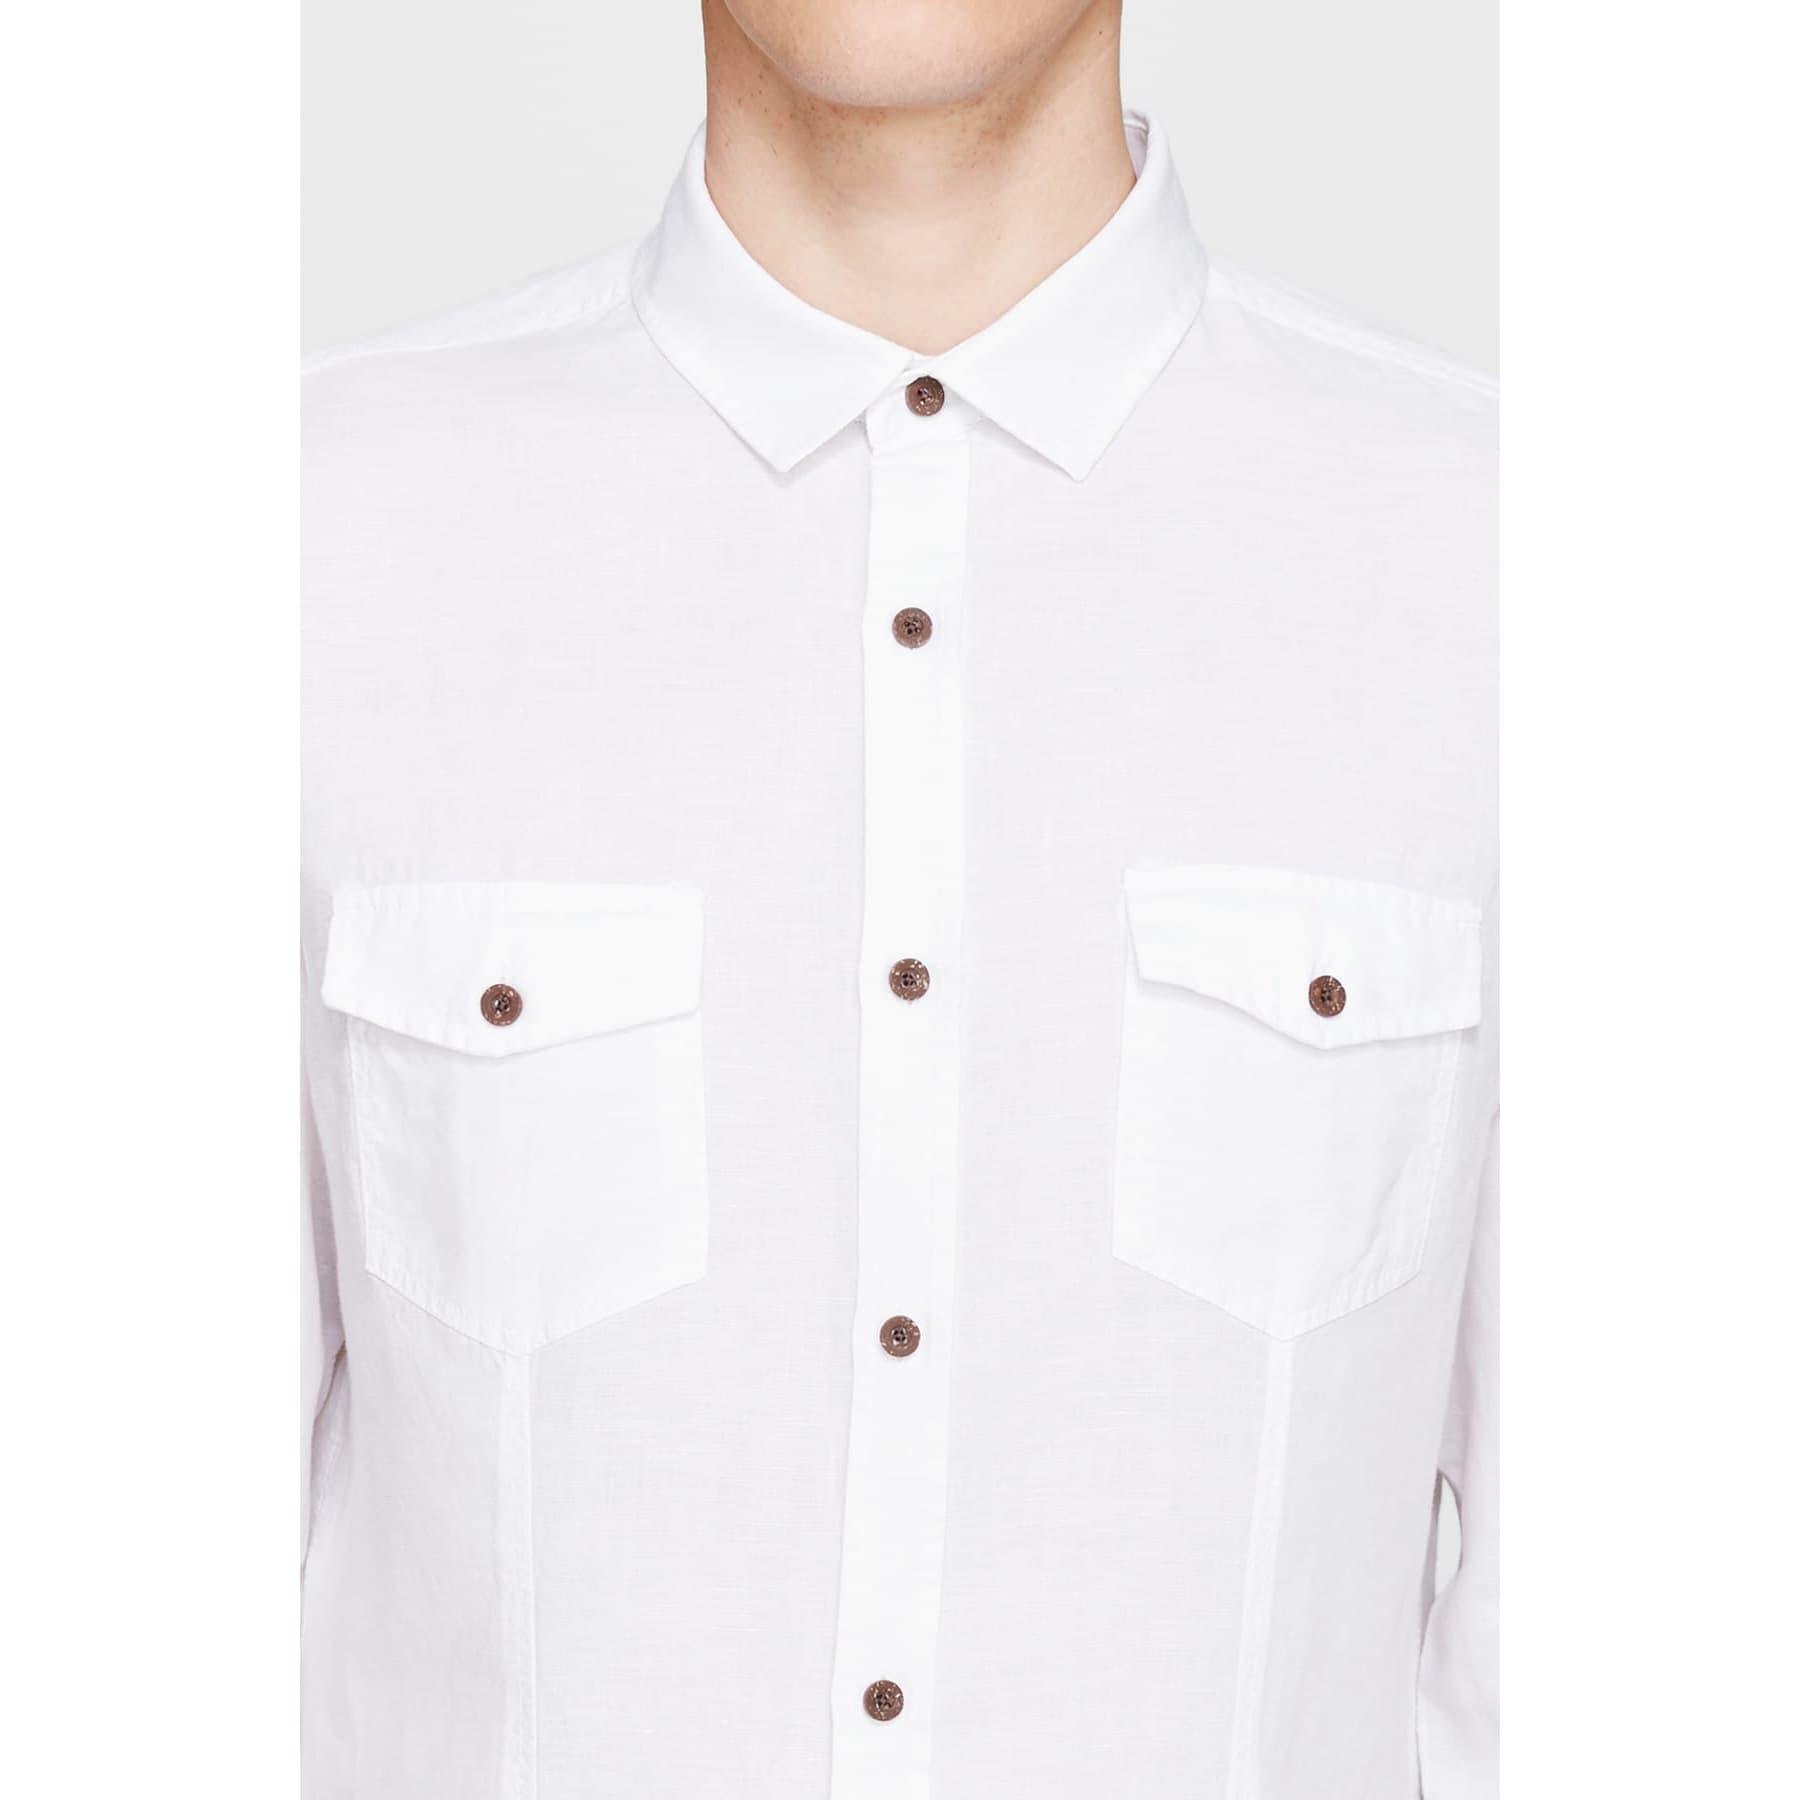 Çift Cepli Erkek Beyaz Keten Gömlek